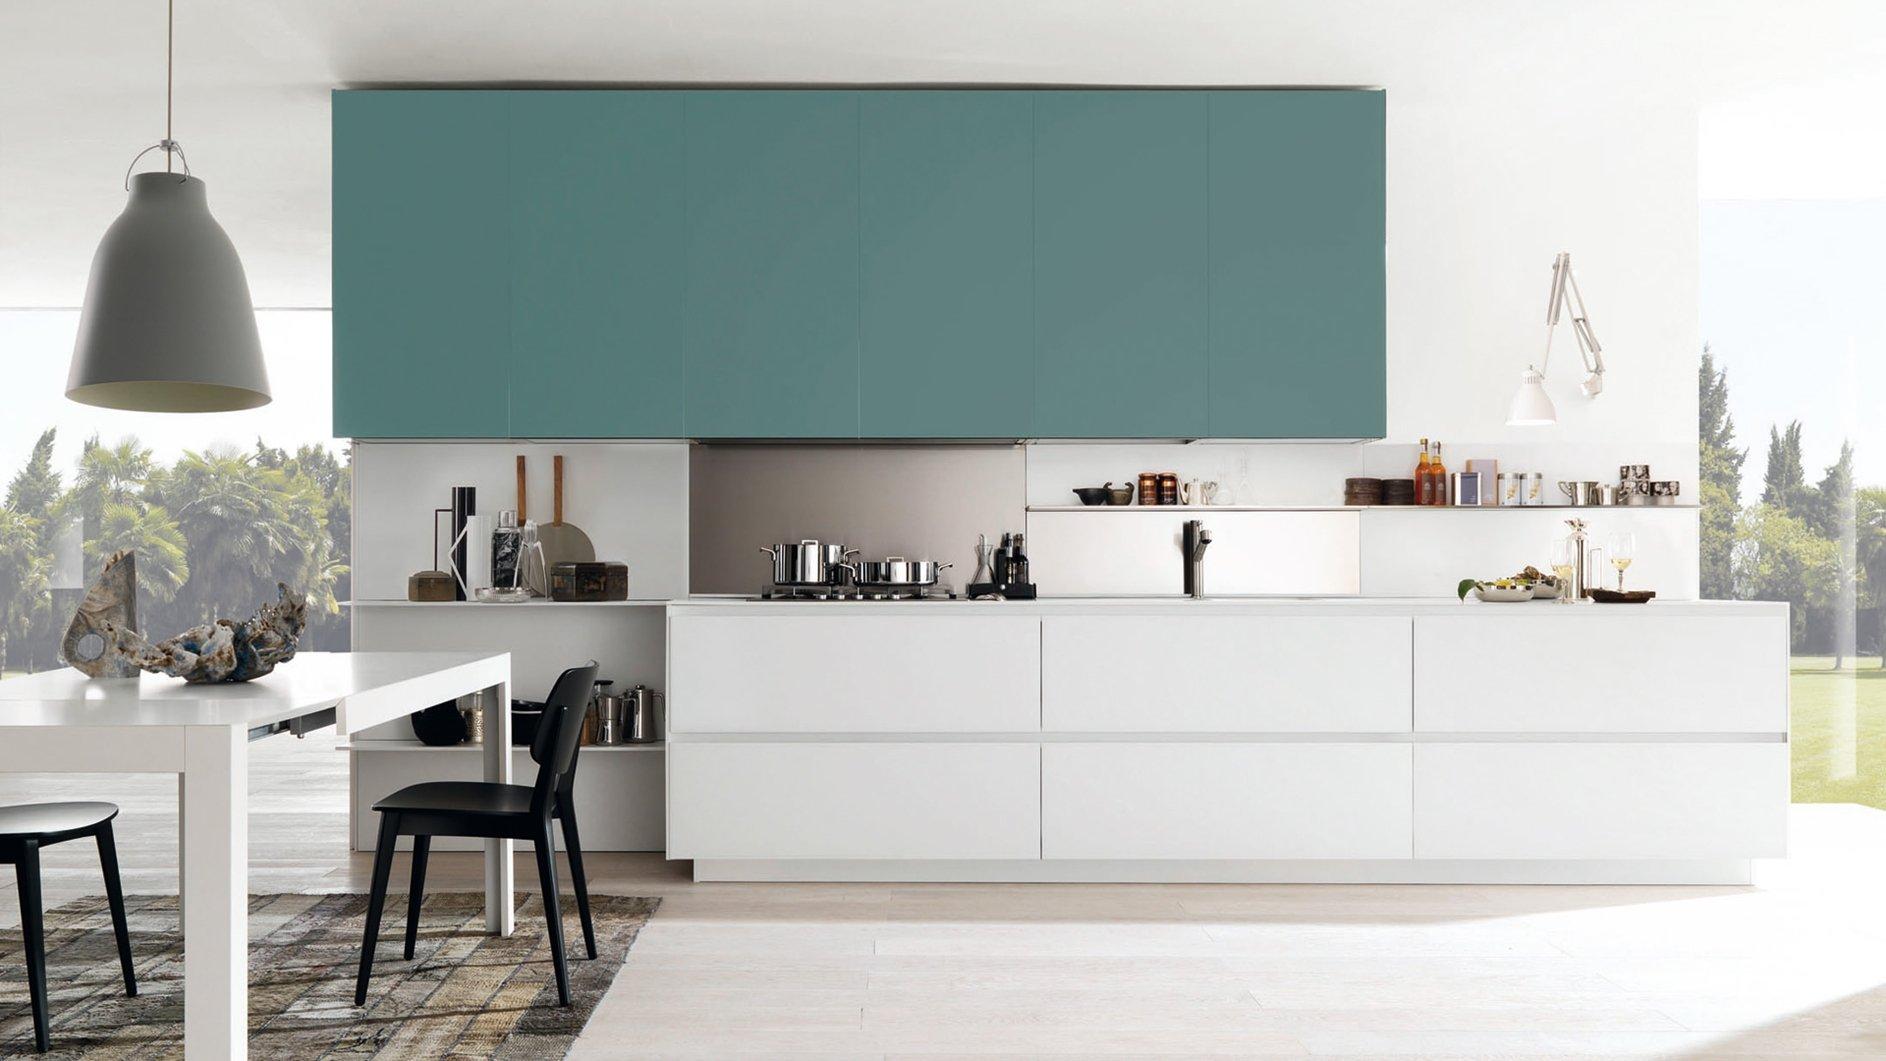 Cucine Ikea Opinioni 2013 : Cucina ikea opinioni 2013. Cucine ikea ...